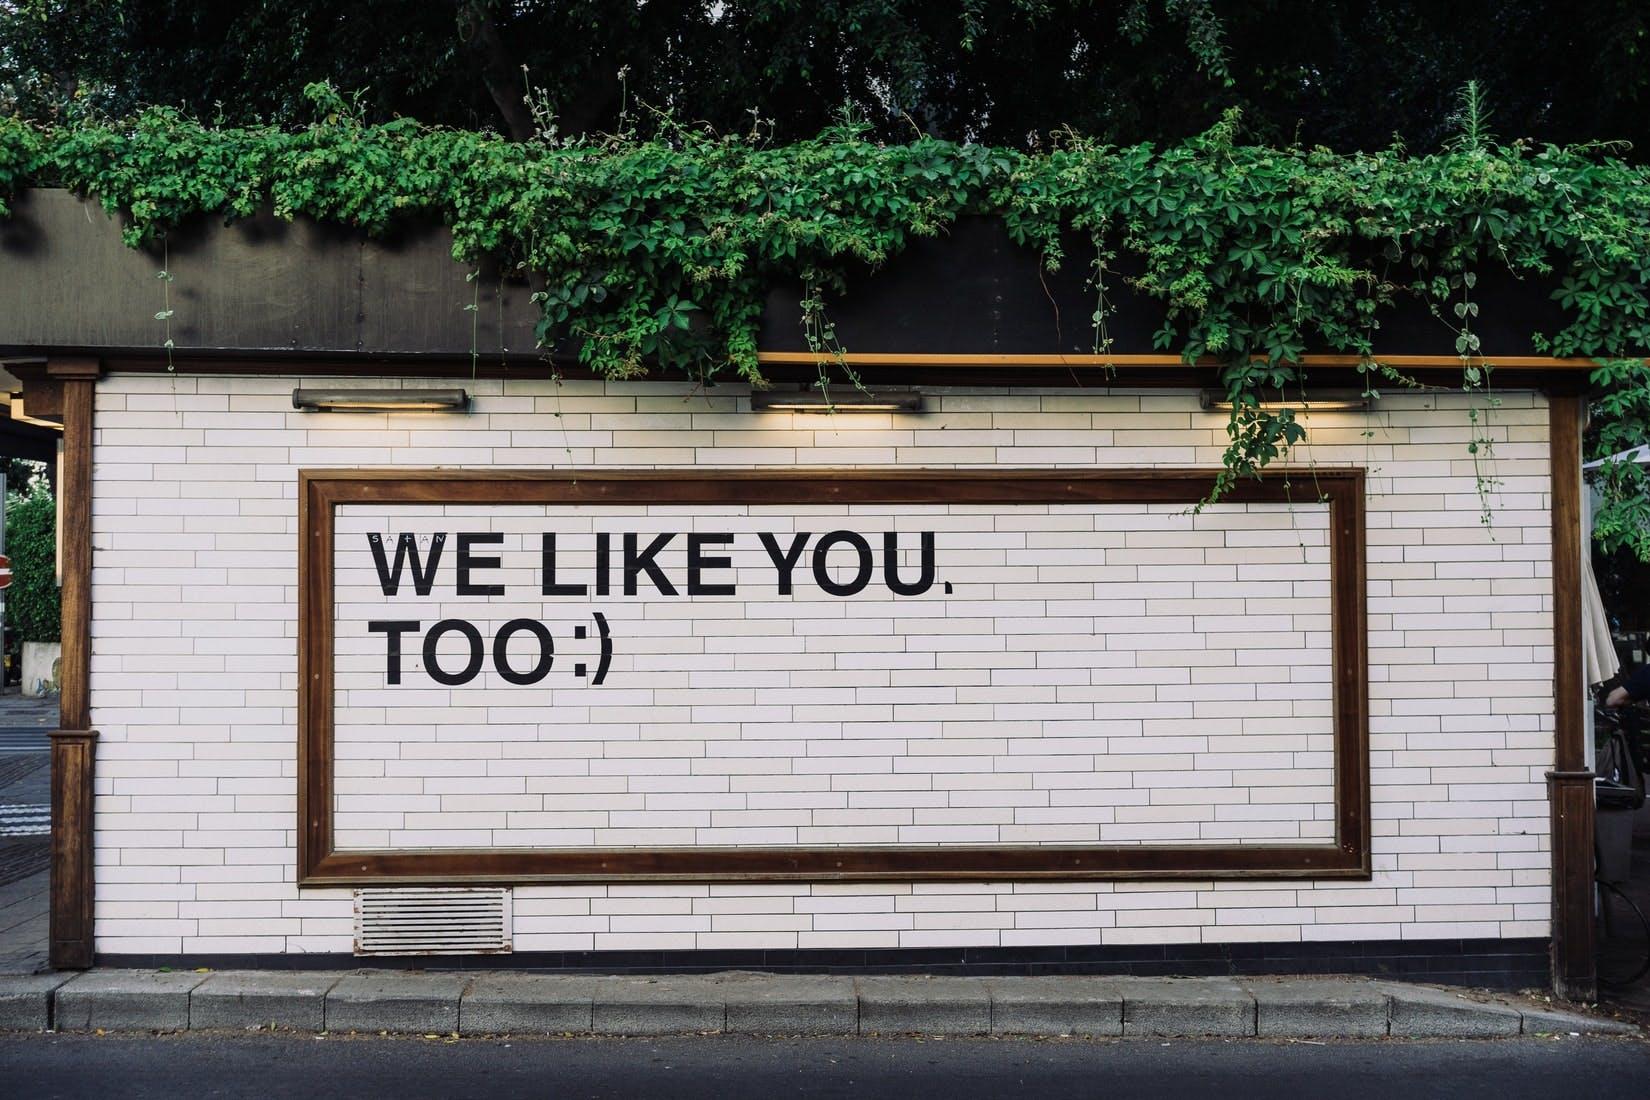 wall art reading we like you too